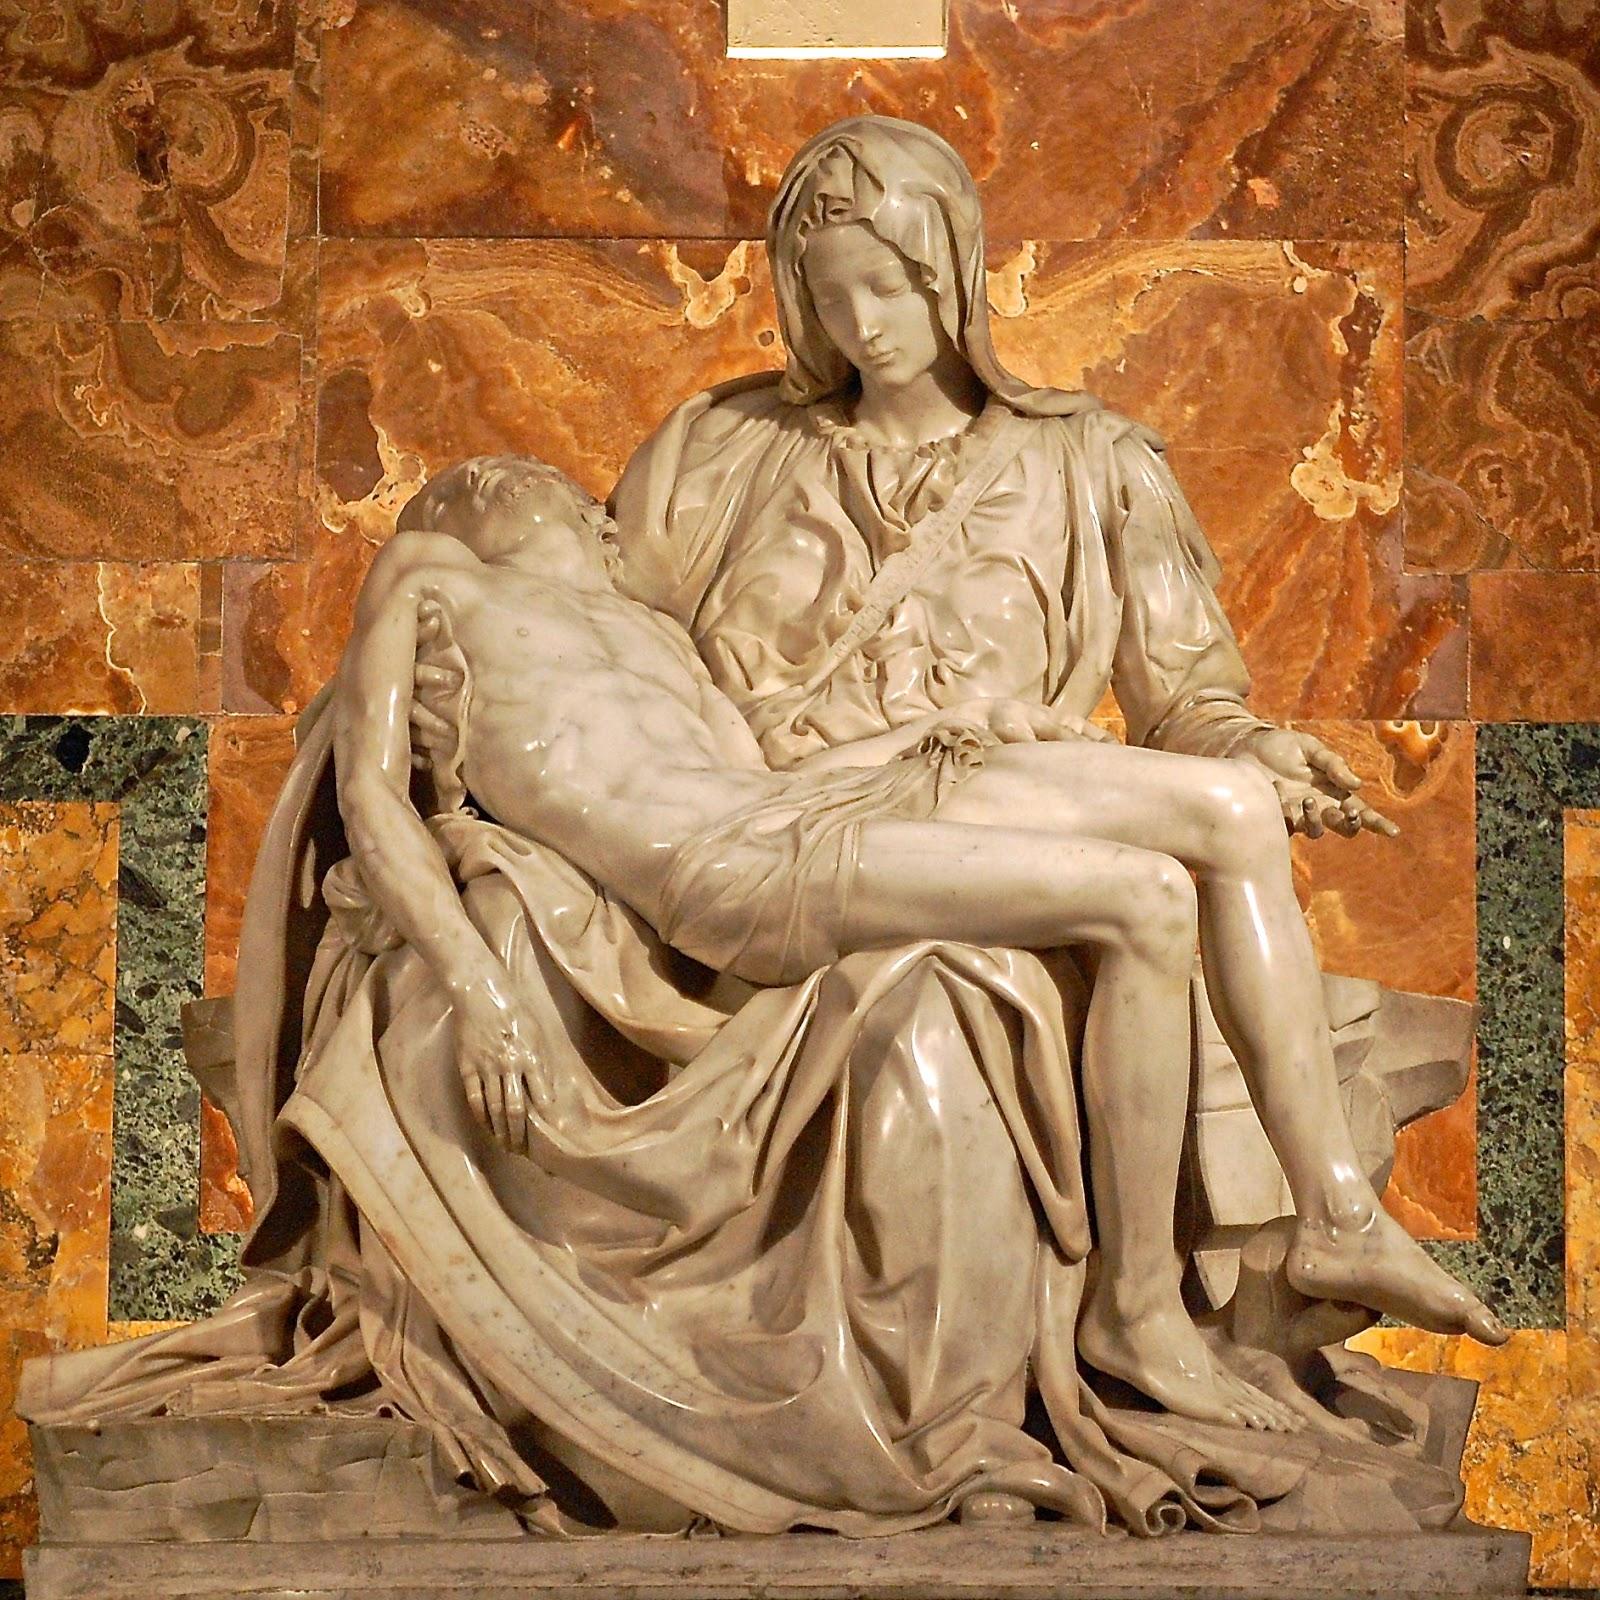 Michelangelo's Pietà in St. Peter's Basilica, Vatican City